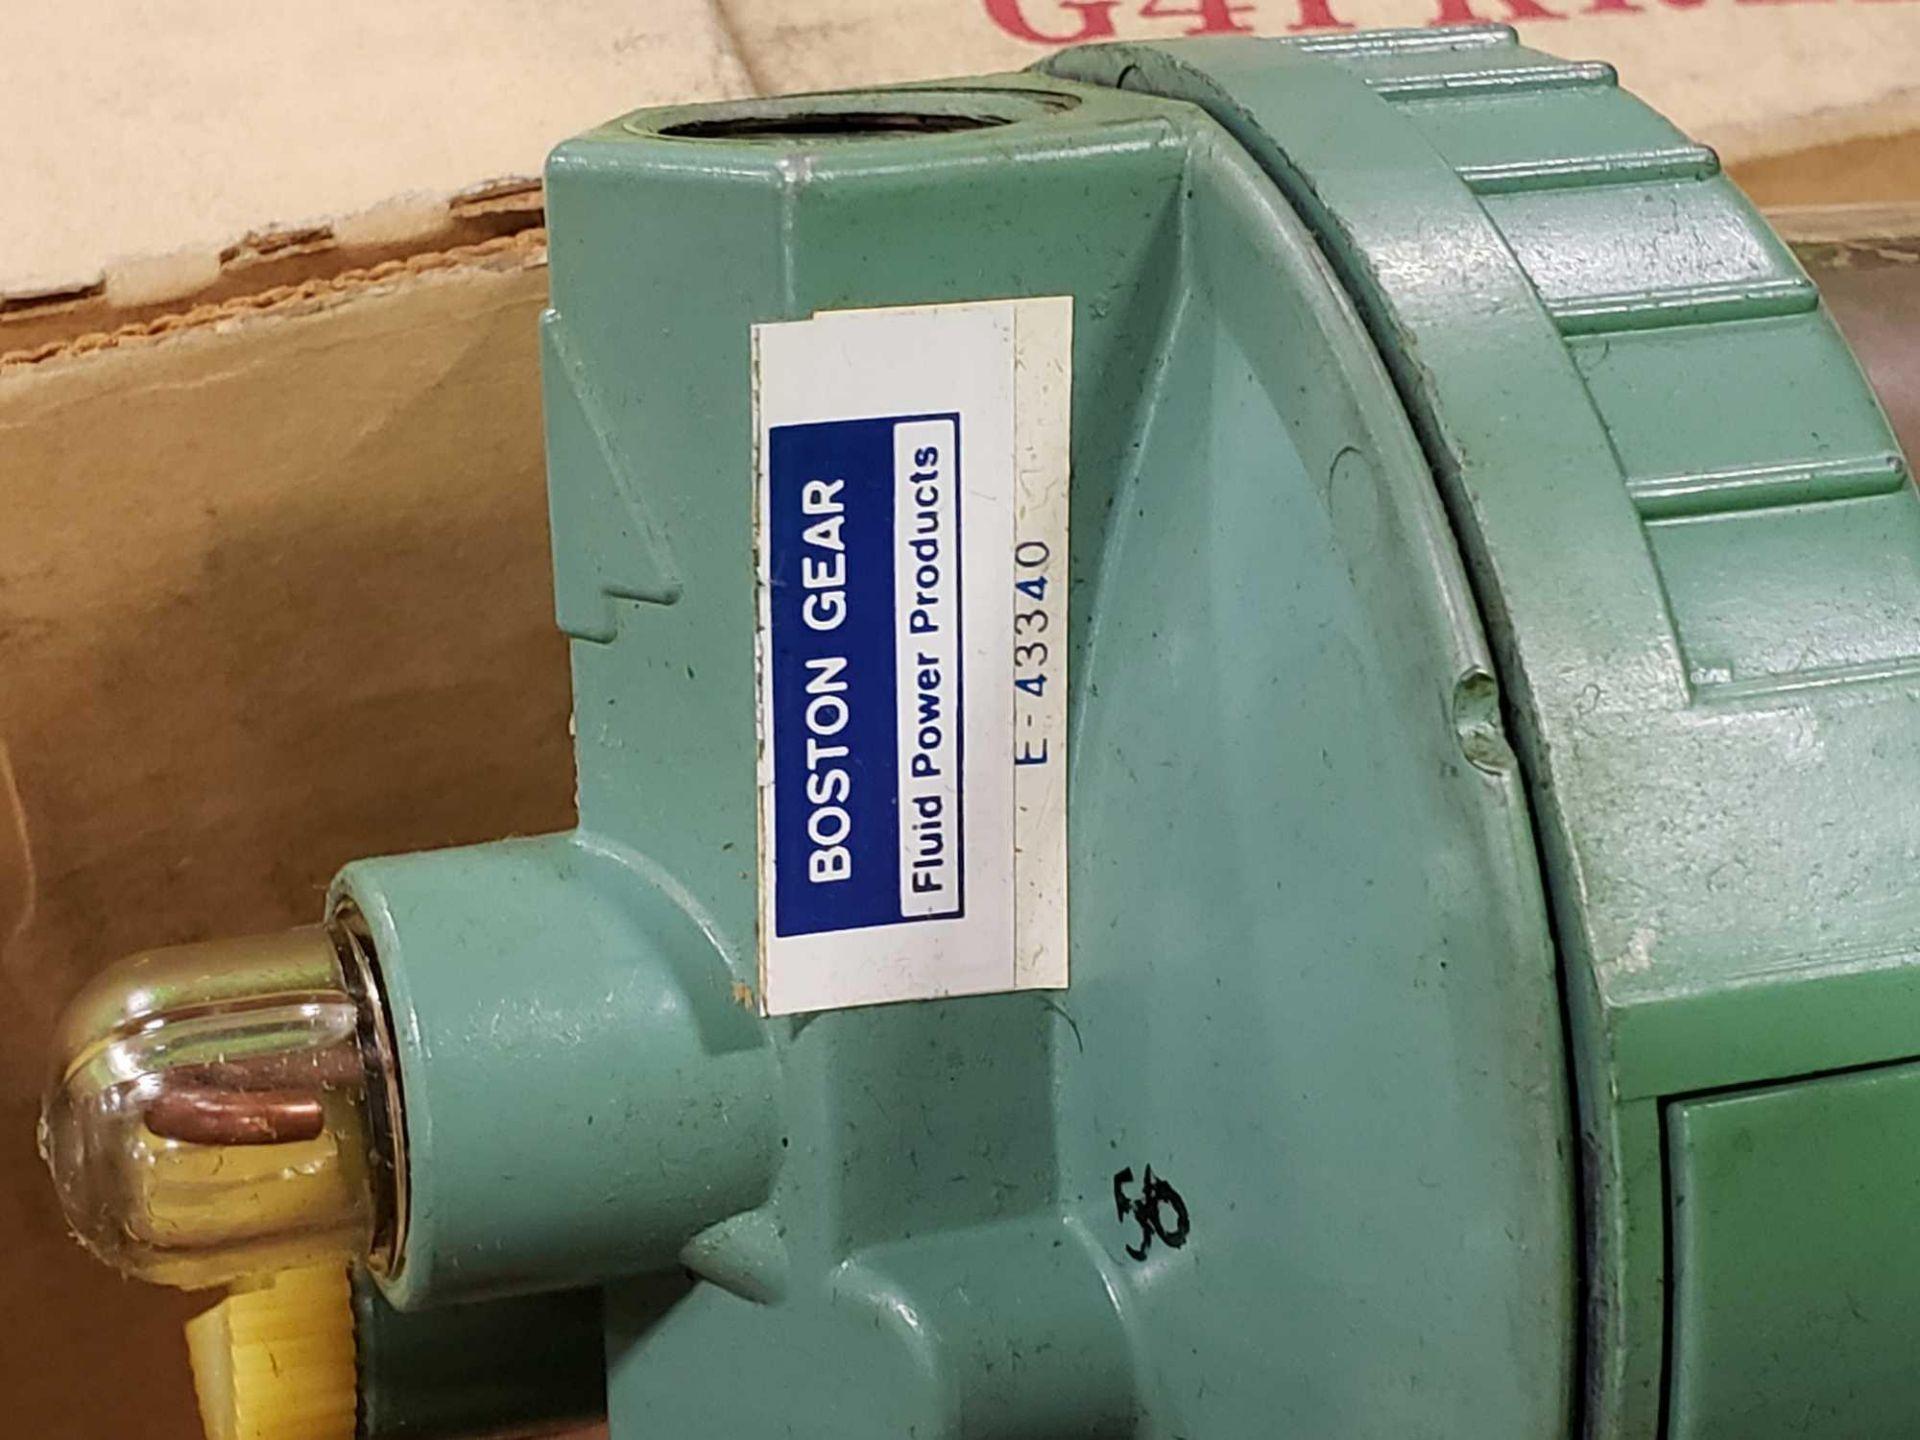 Lot 38 - Qty 3 - Boston Gear Fluid Power Products model E-43340 filter unit. New in box.